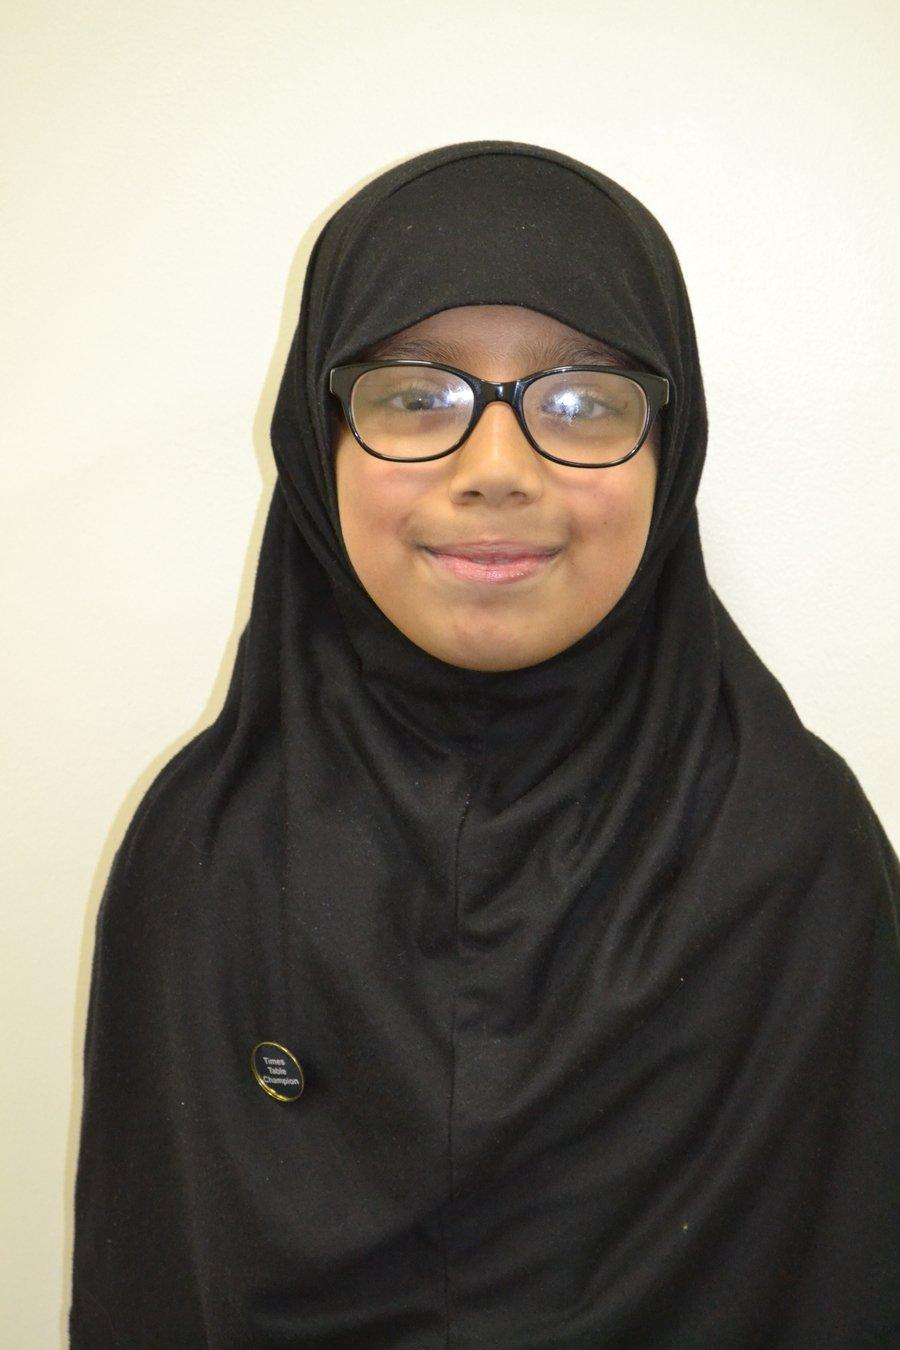 Well done Mariyah!